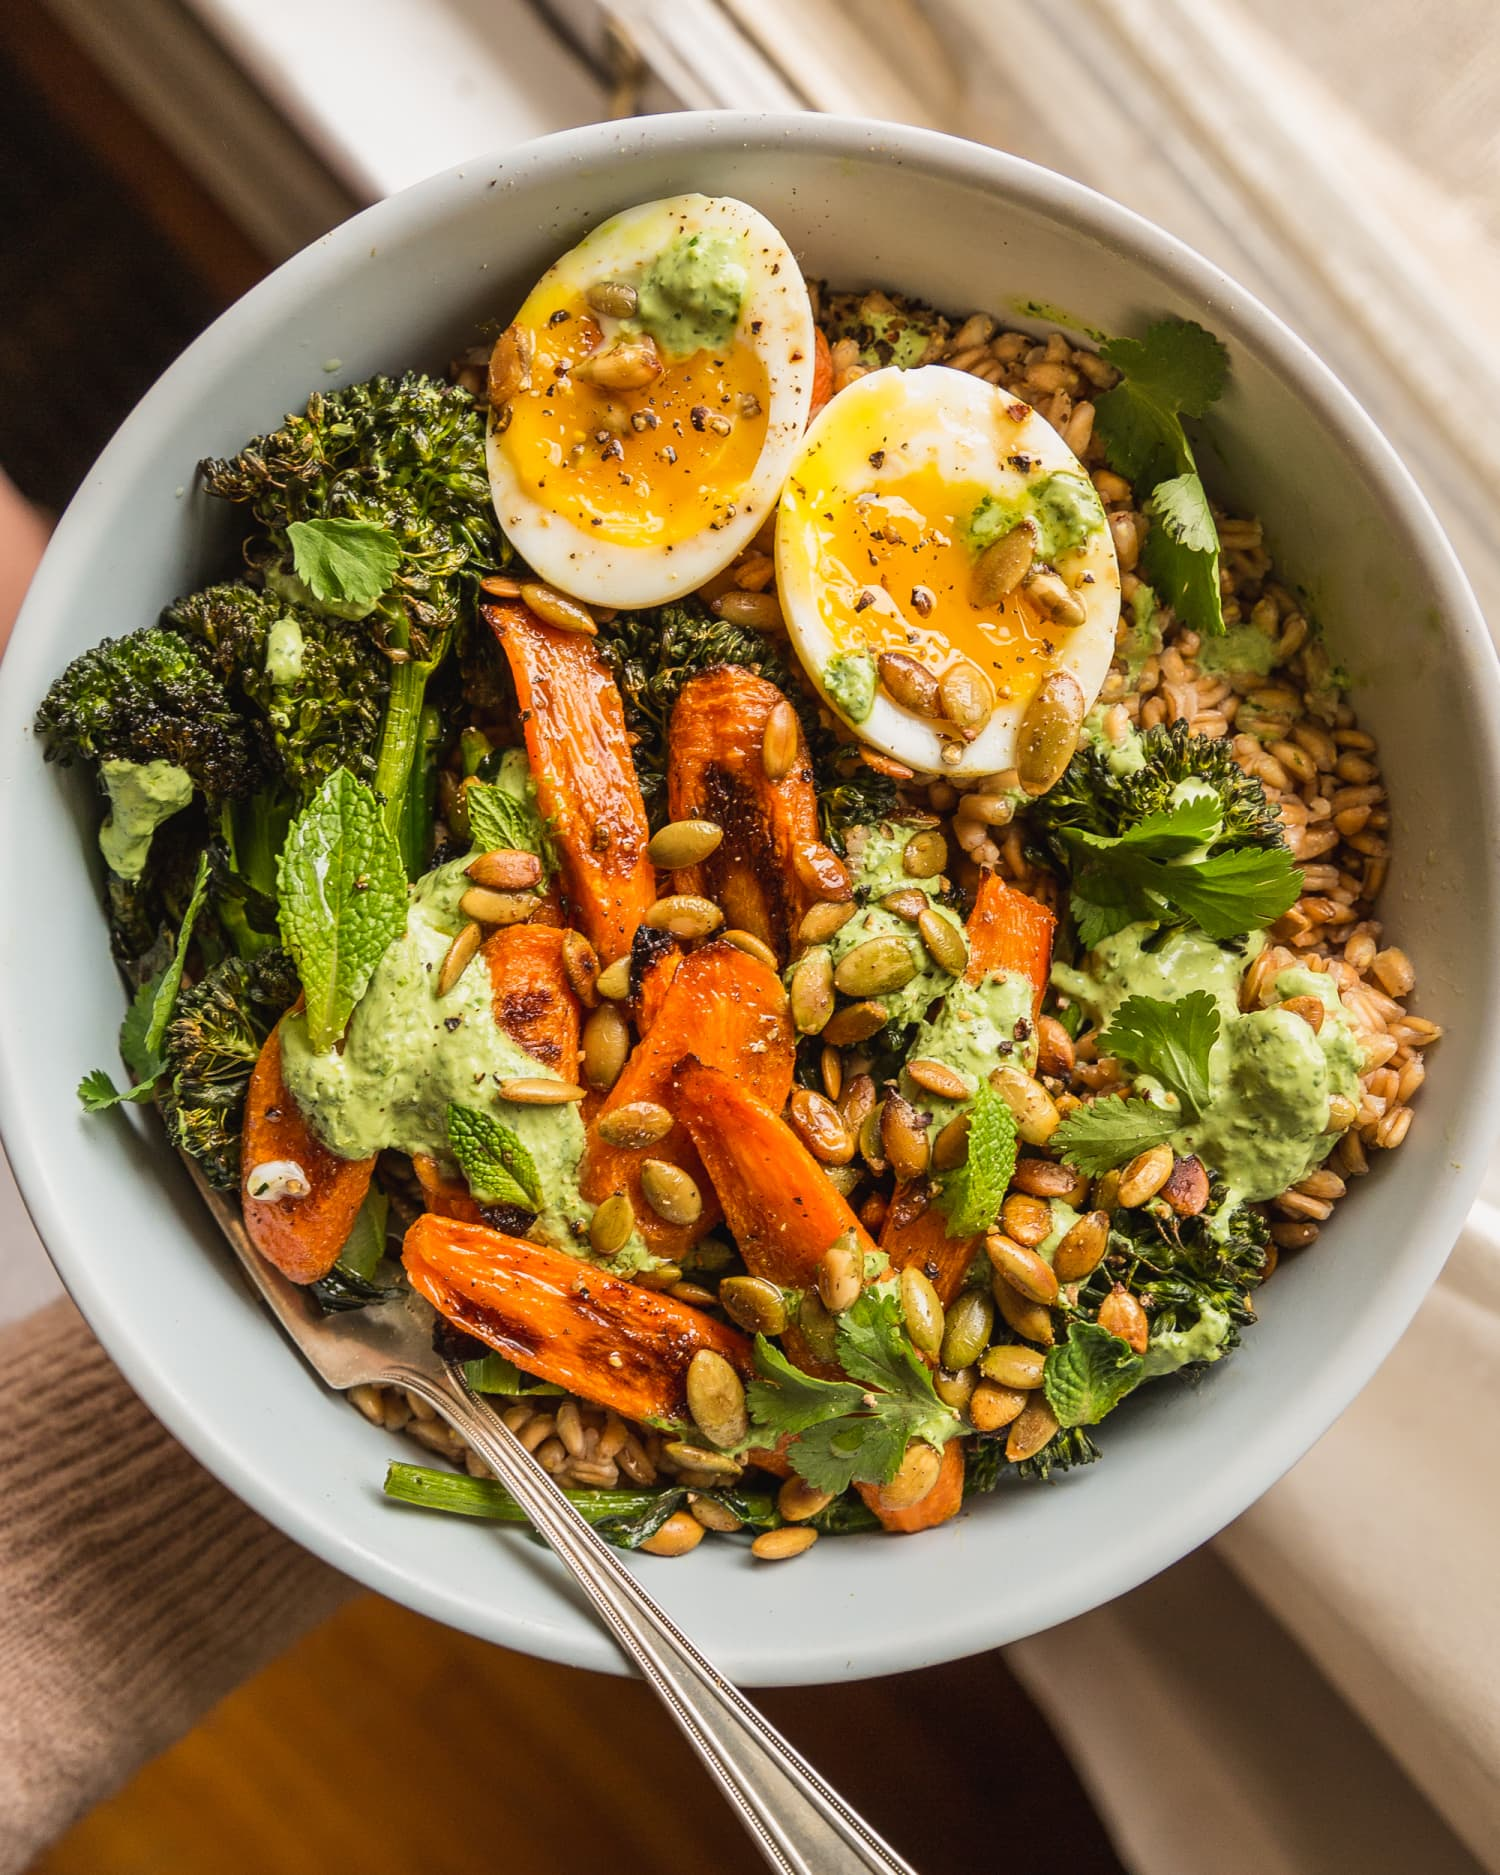 Recipe: Farro with Caramelized Carrots, Crispy Broccolini, and Herby Yogurt Dressing